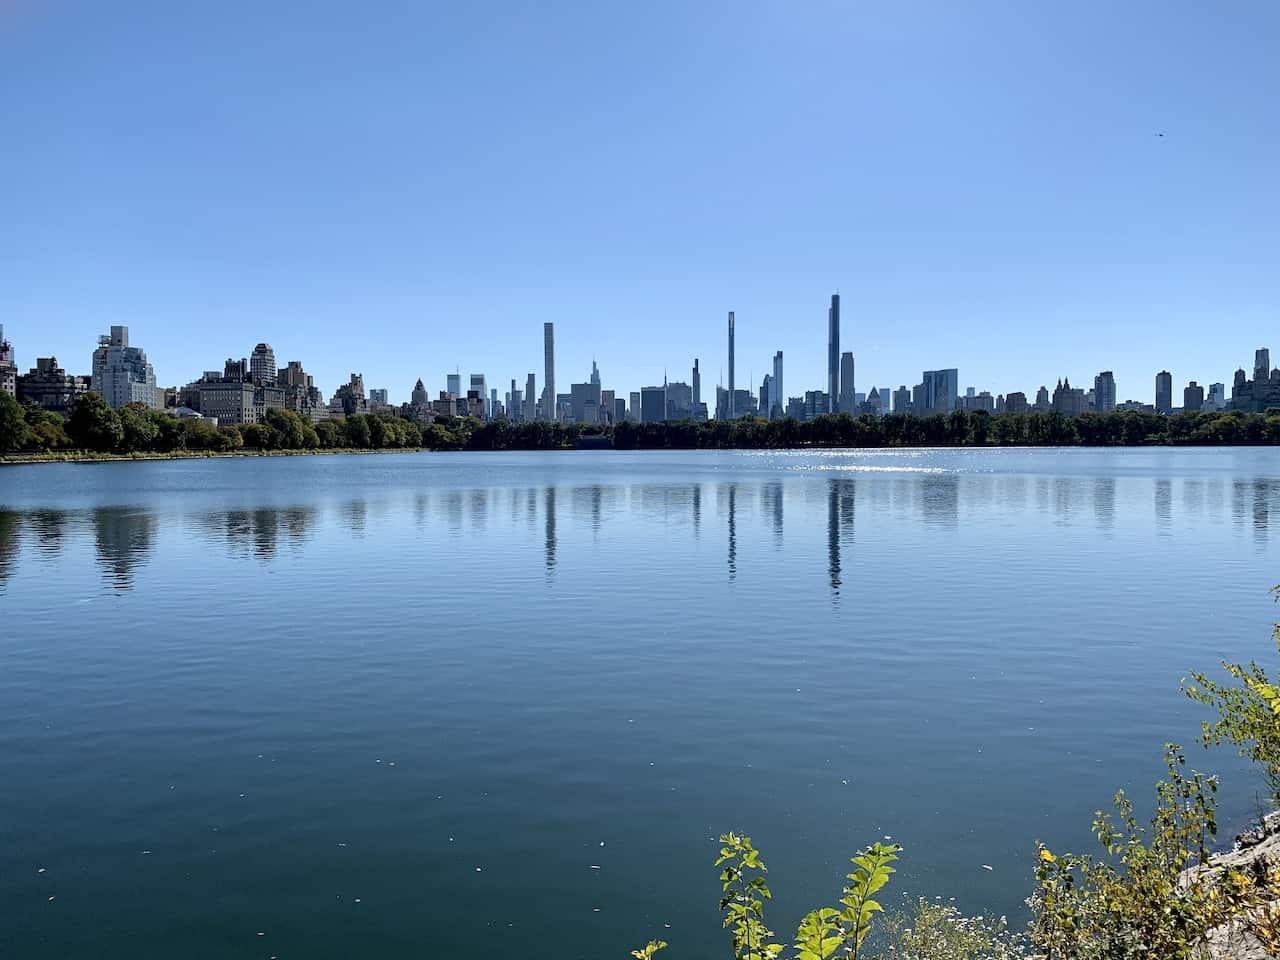 The Reservoir Central Park Trails